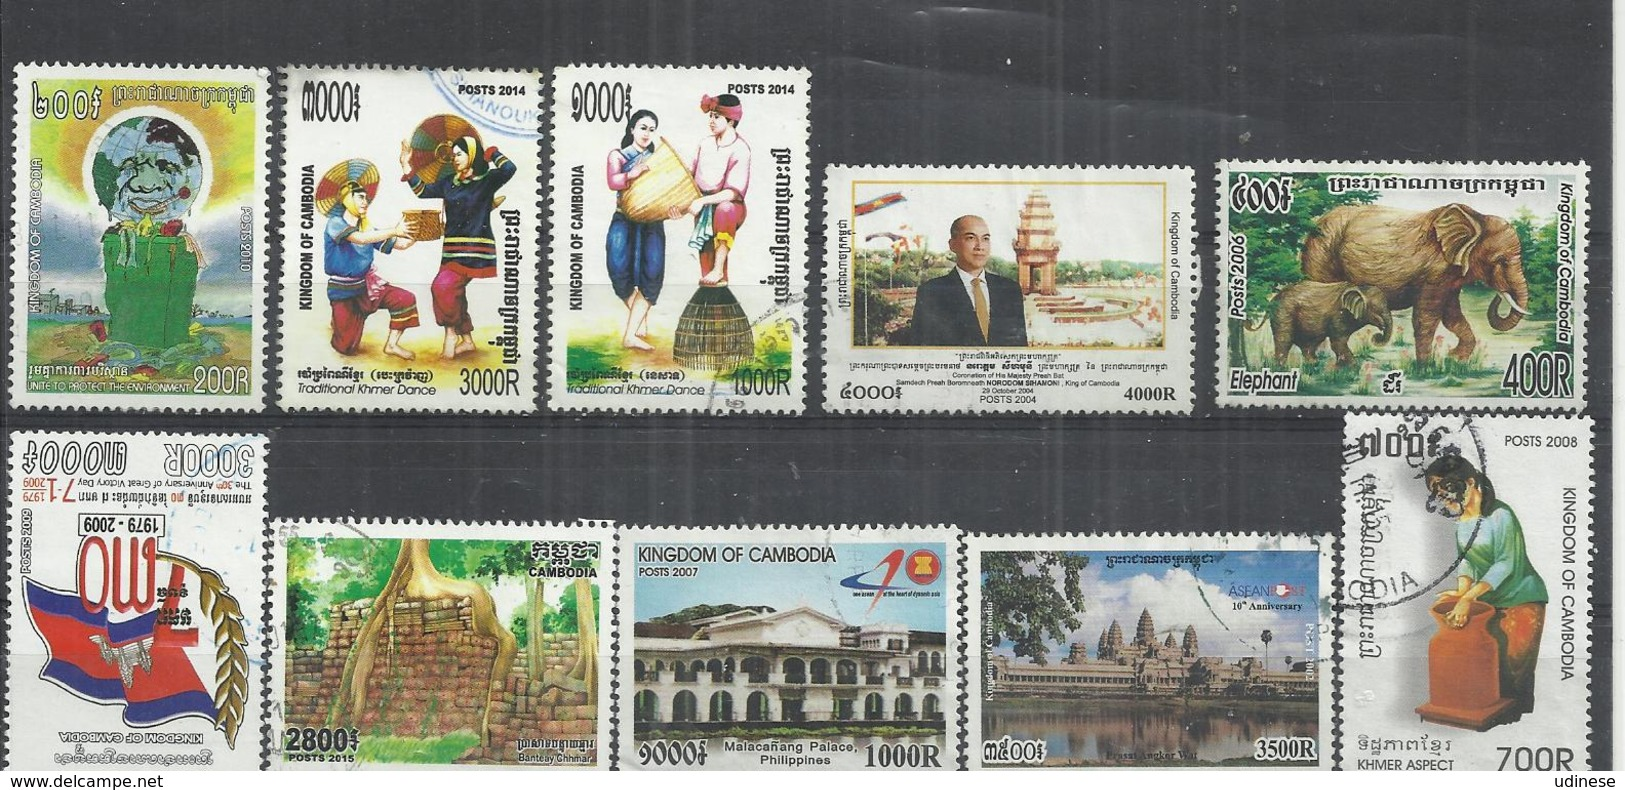 TEN AT A TIME - CAMBODIA - LOT OF 10 DIFFERENT COMMEMORATIVE  9 - POSTALLY USED OBLITERE GESTEMPELT USADO - NO CTO - Cambodia